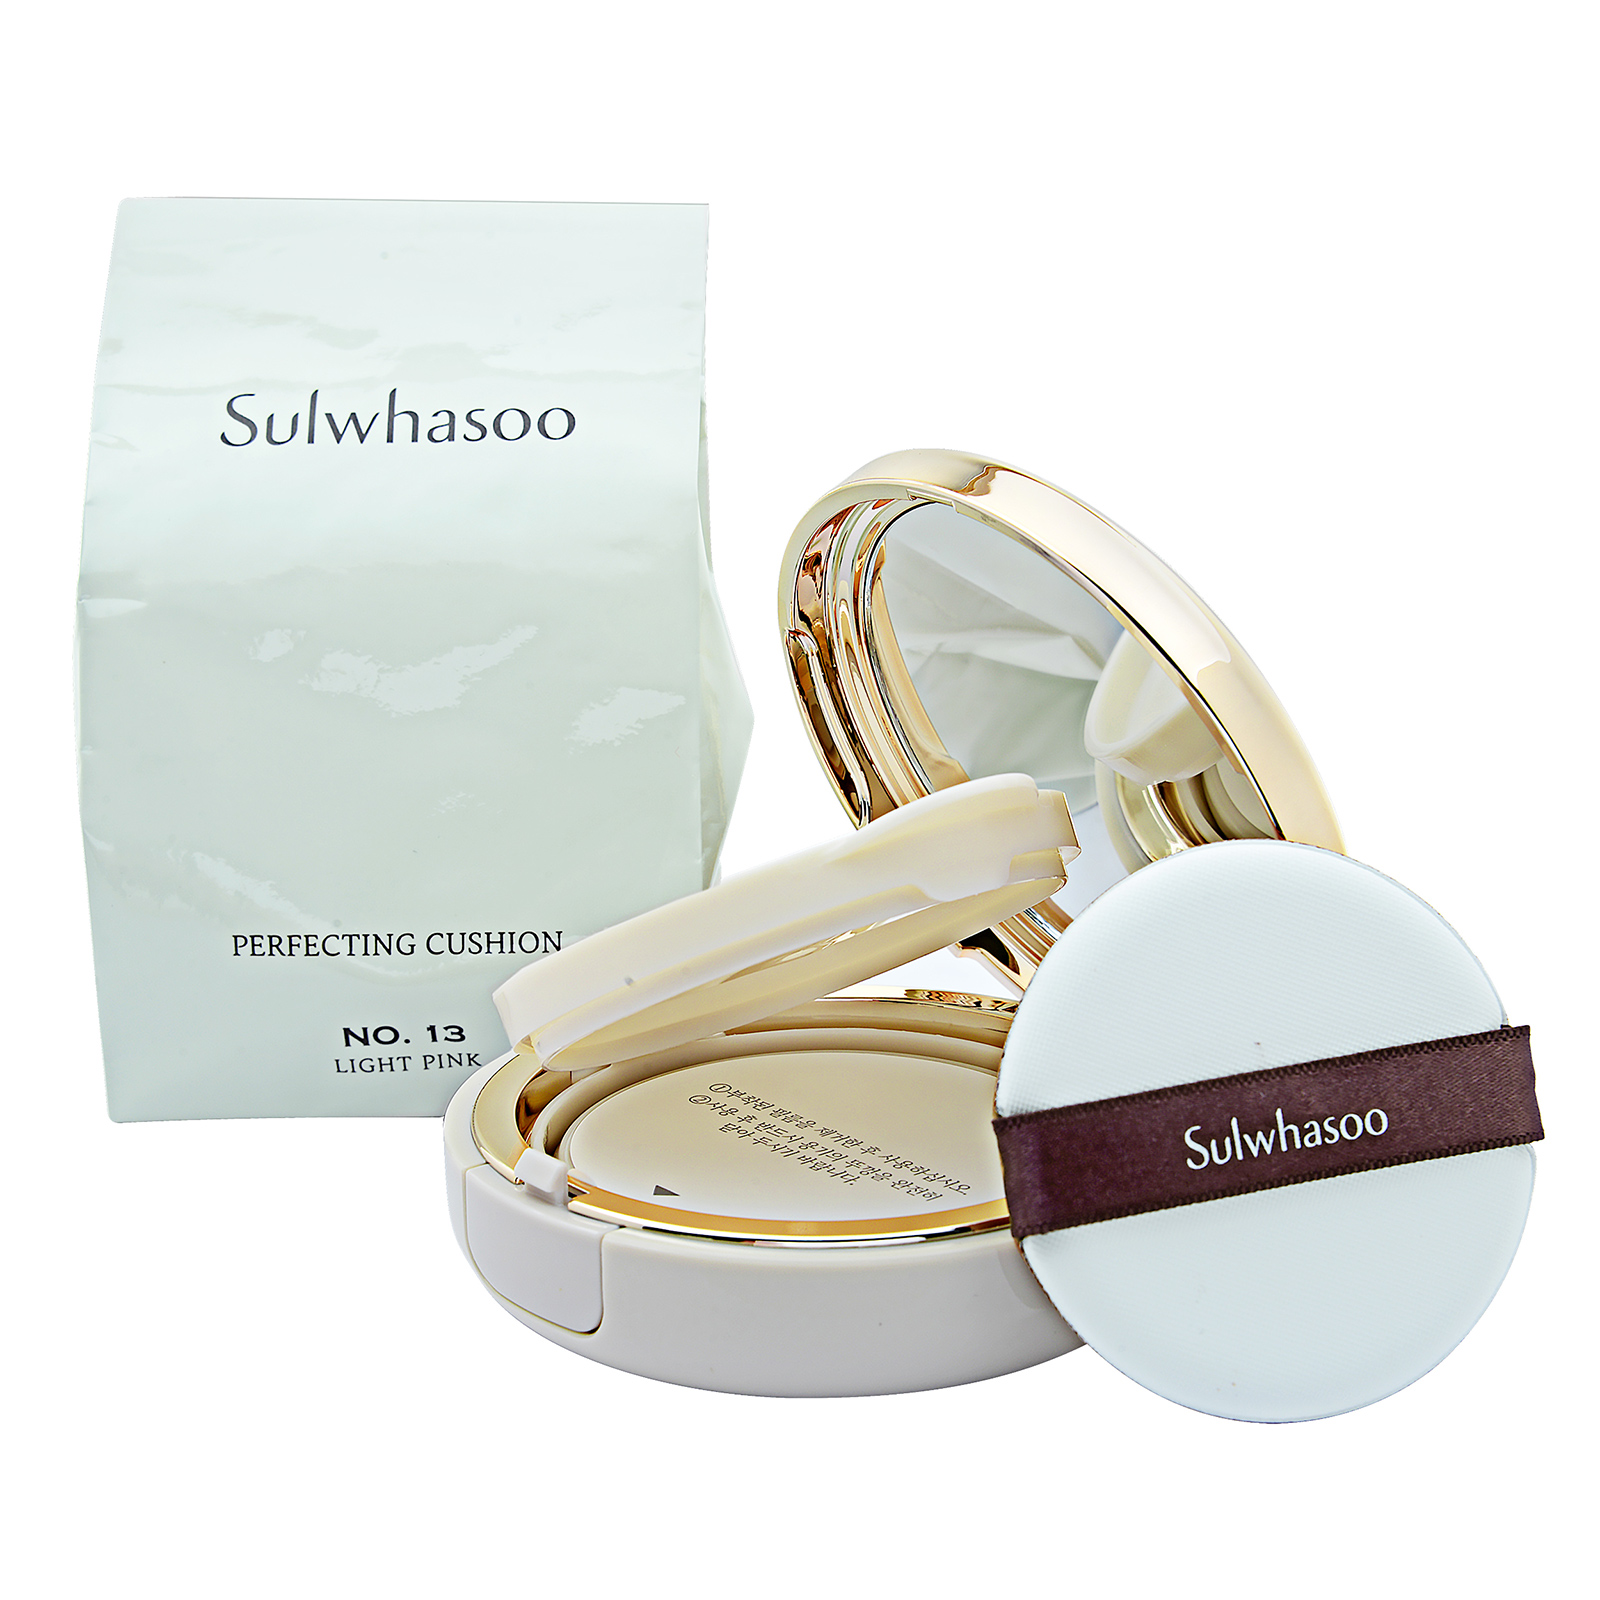 Sulwhasoo Perfecting Cushion SPF50+ / PA+++ No.13 Light Pink, 2 x 15g,